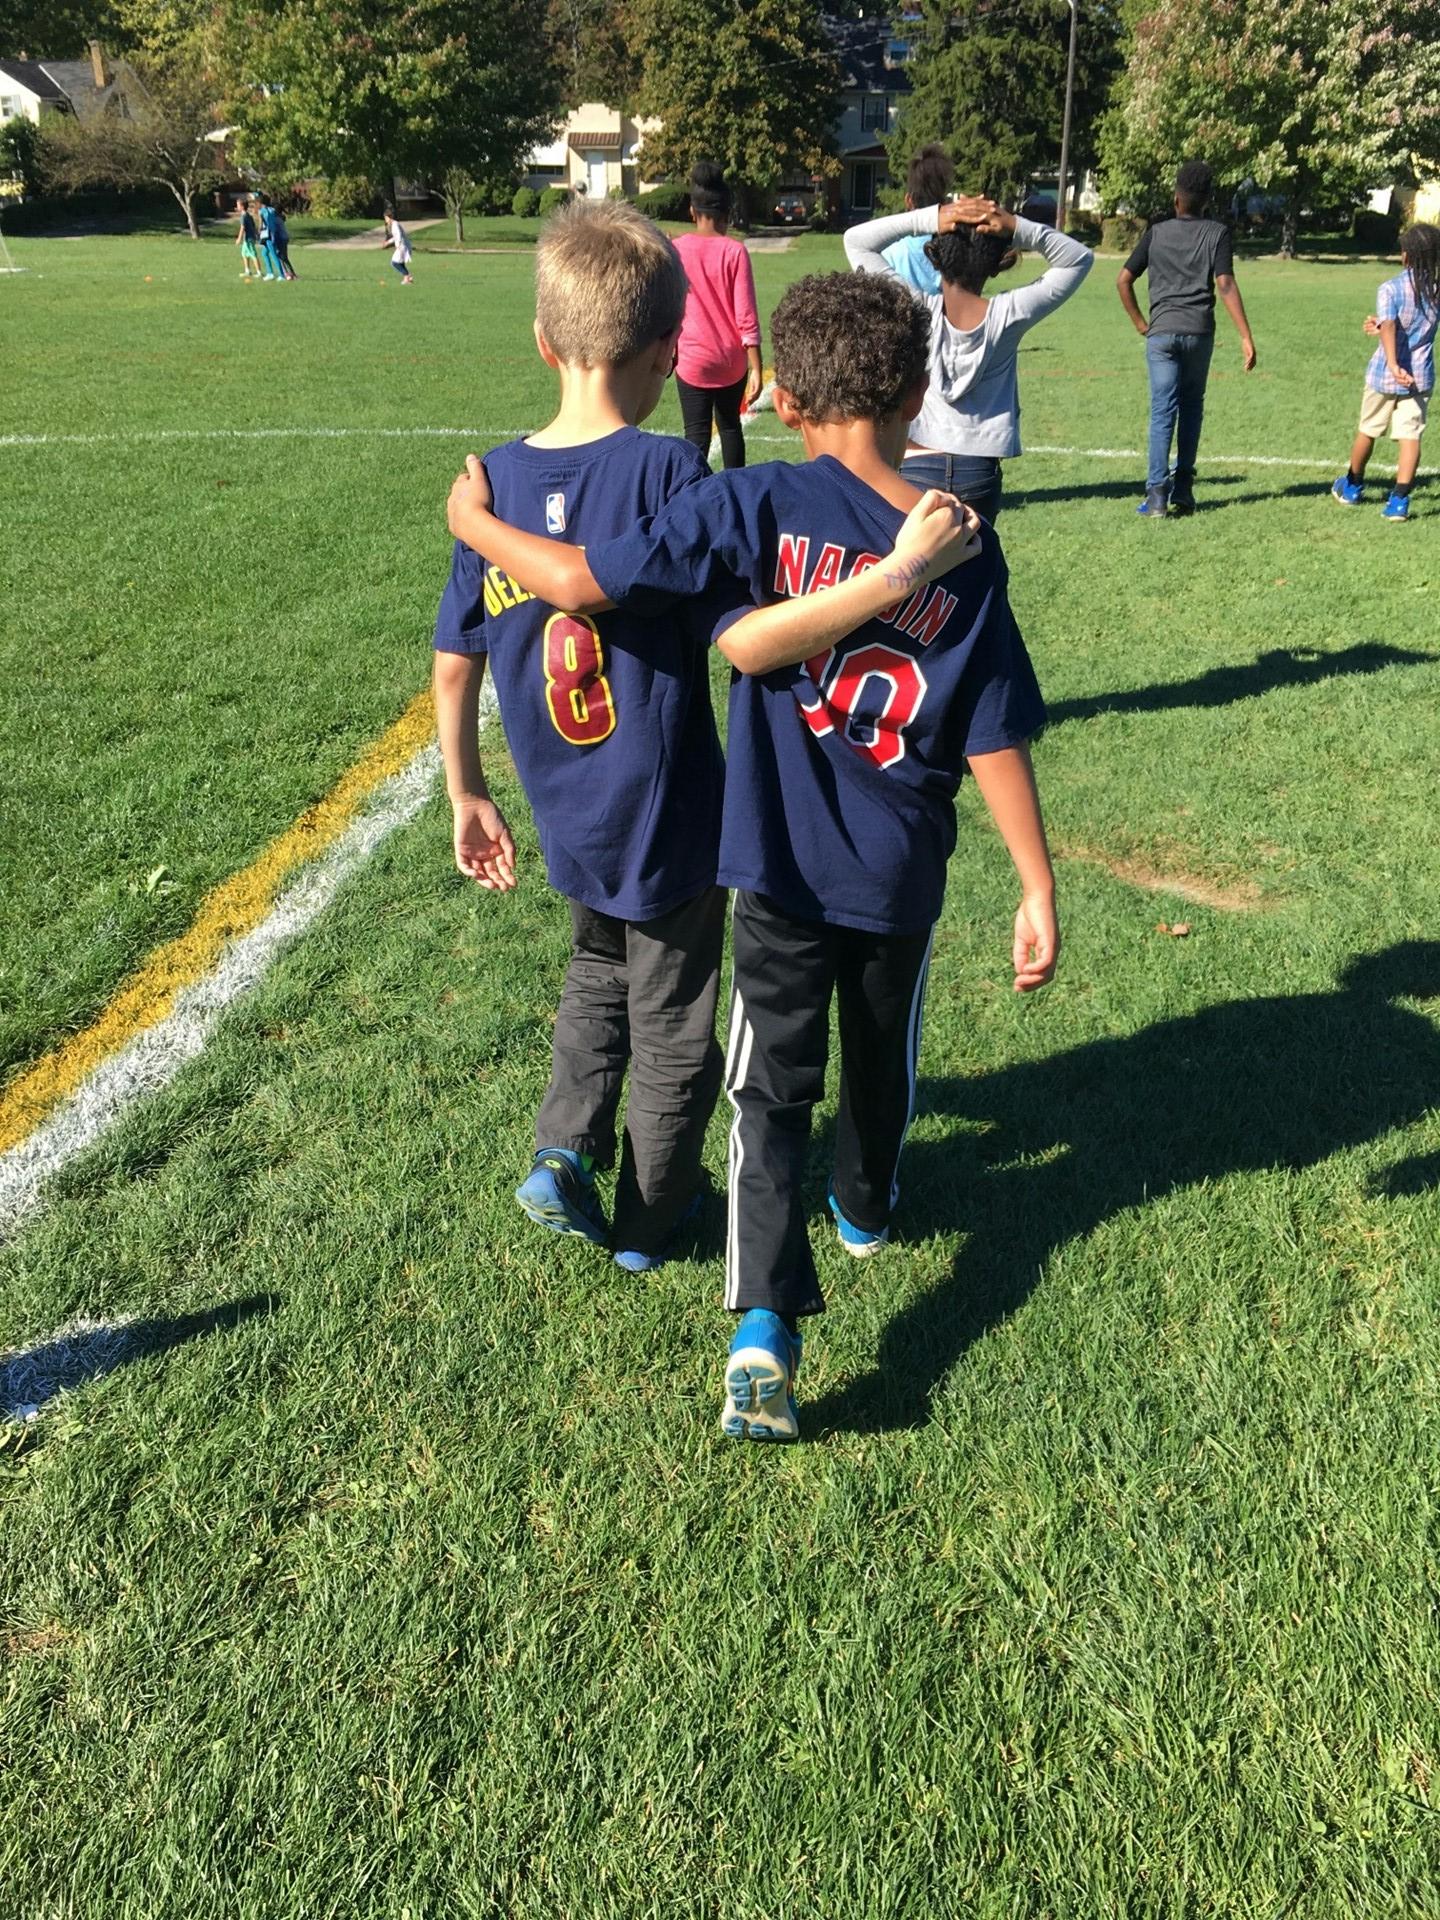 2016 Fun Run at Canterbury School